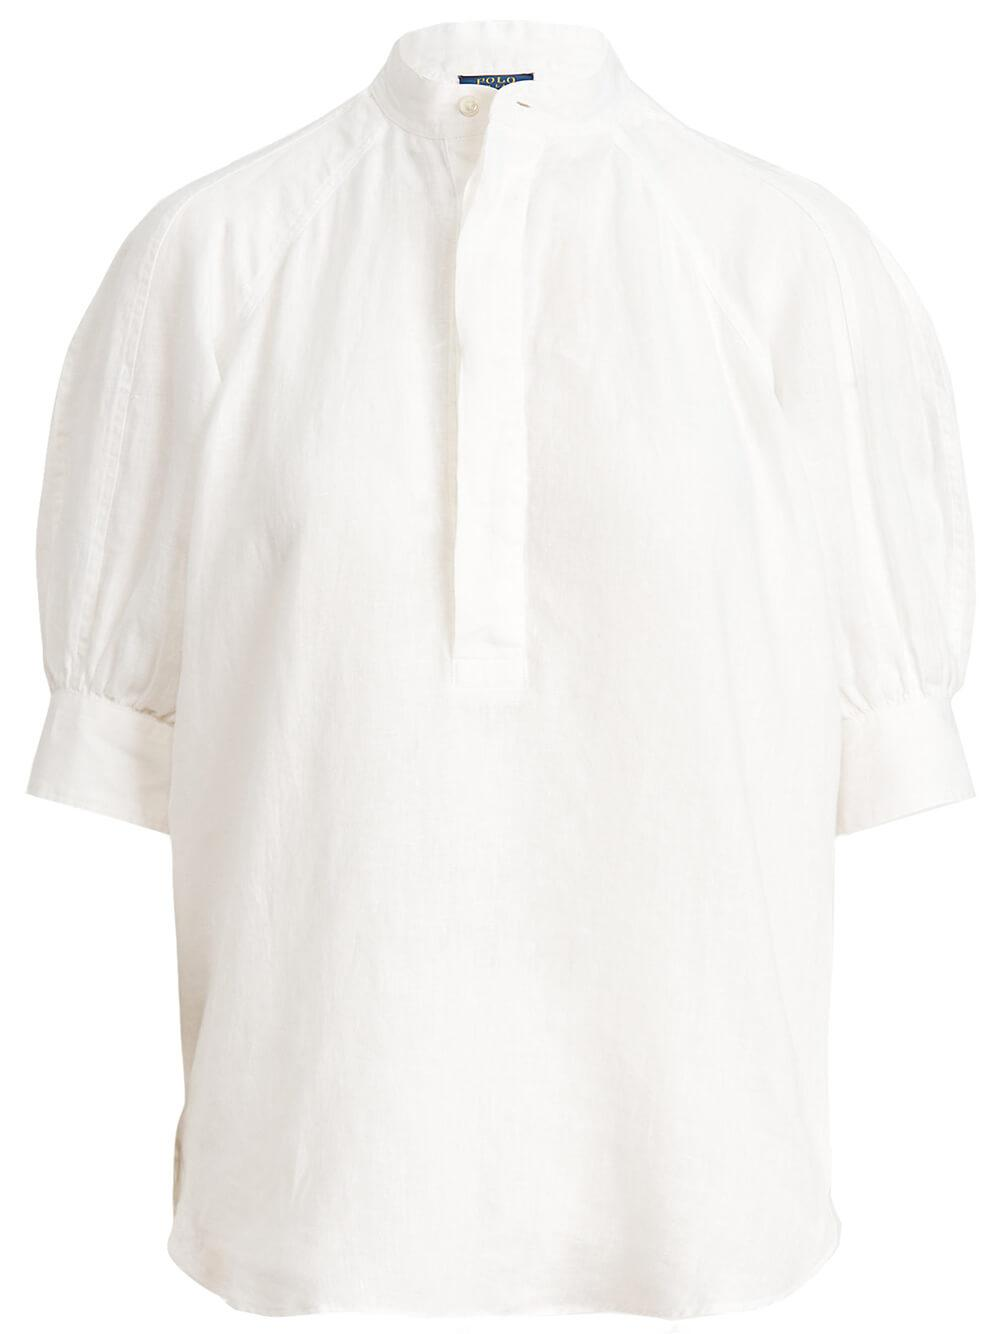 Cici Mid-Sleeve Blouse